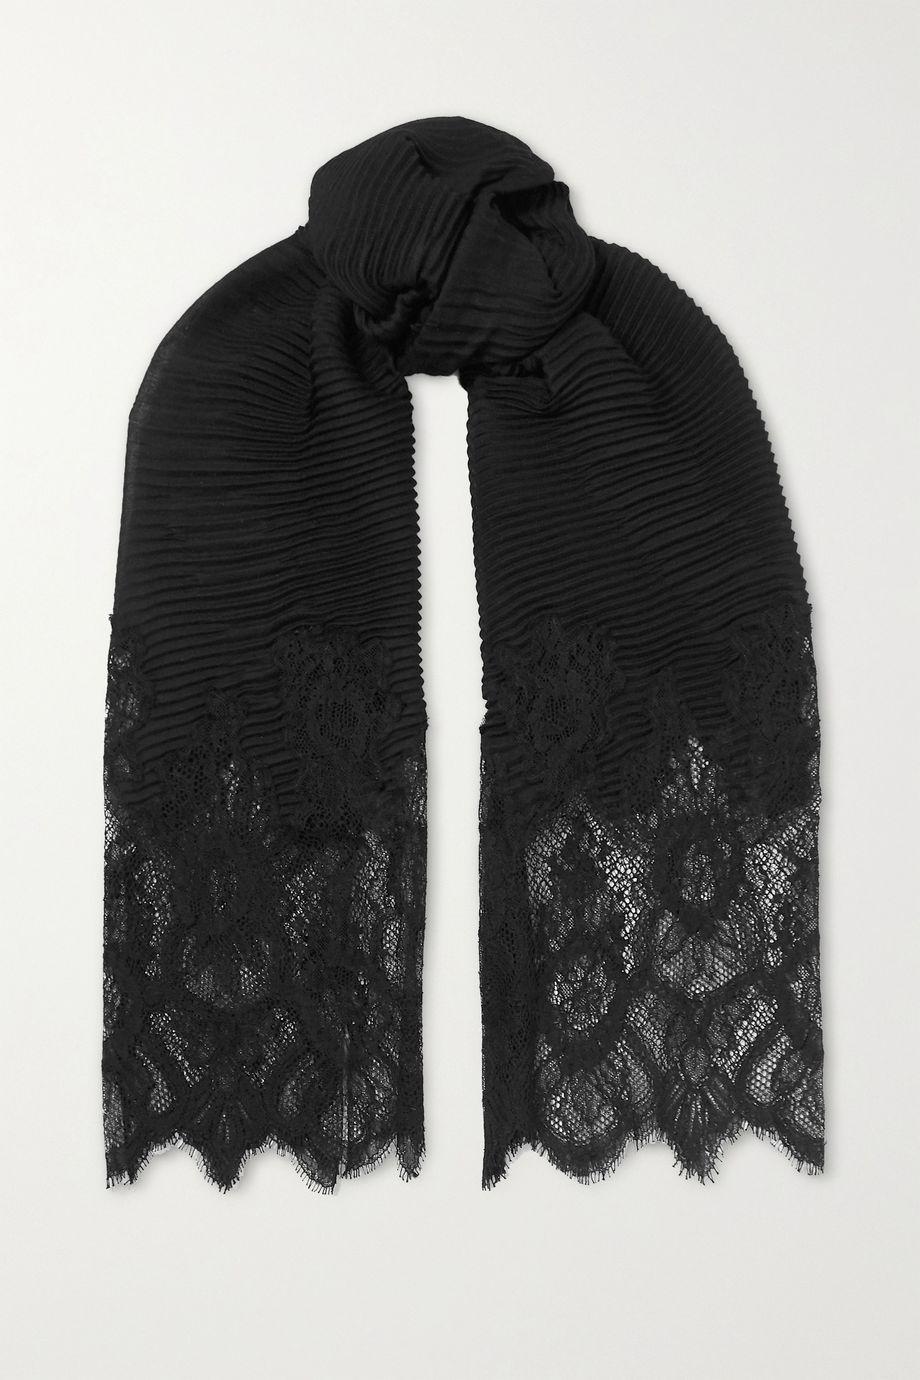 Valentino Valentino Garavani lace-paneled plissé cashmere and wool-blend scarf